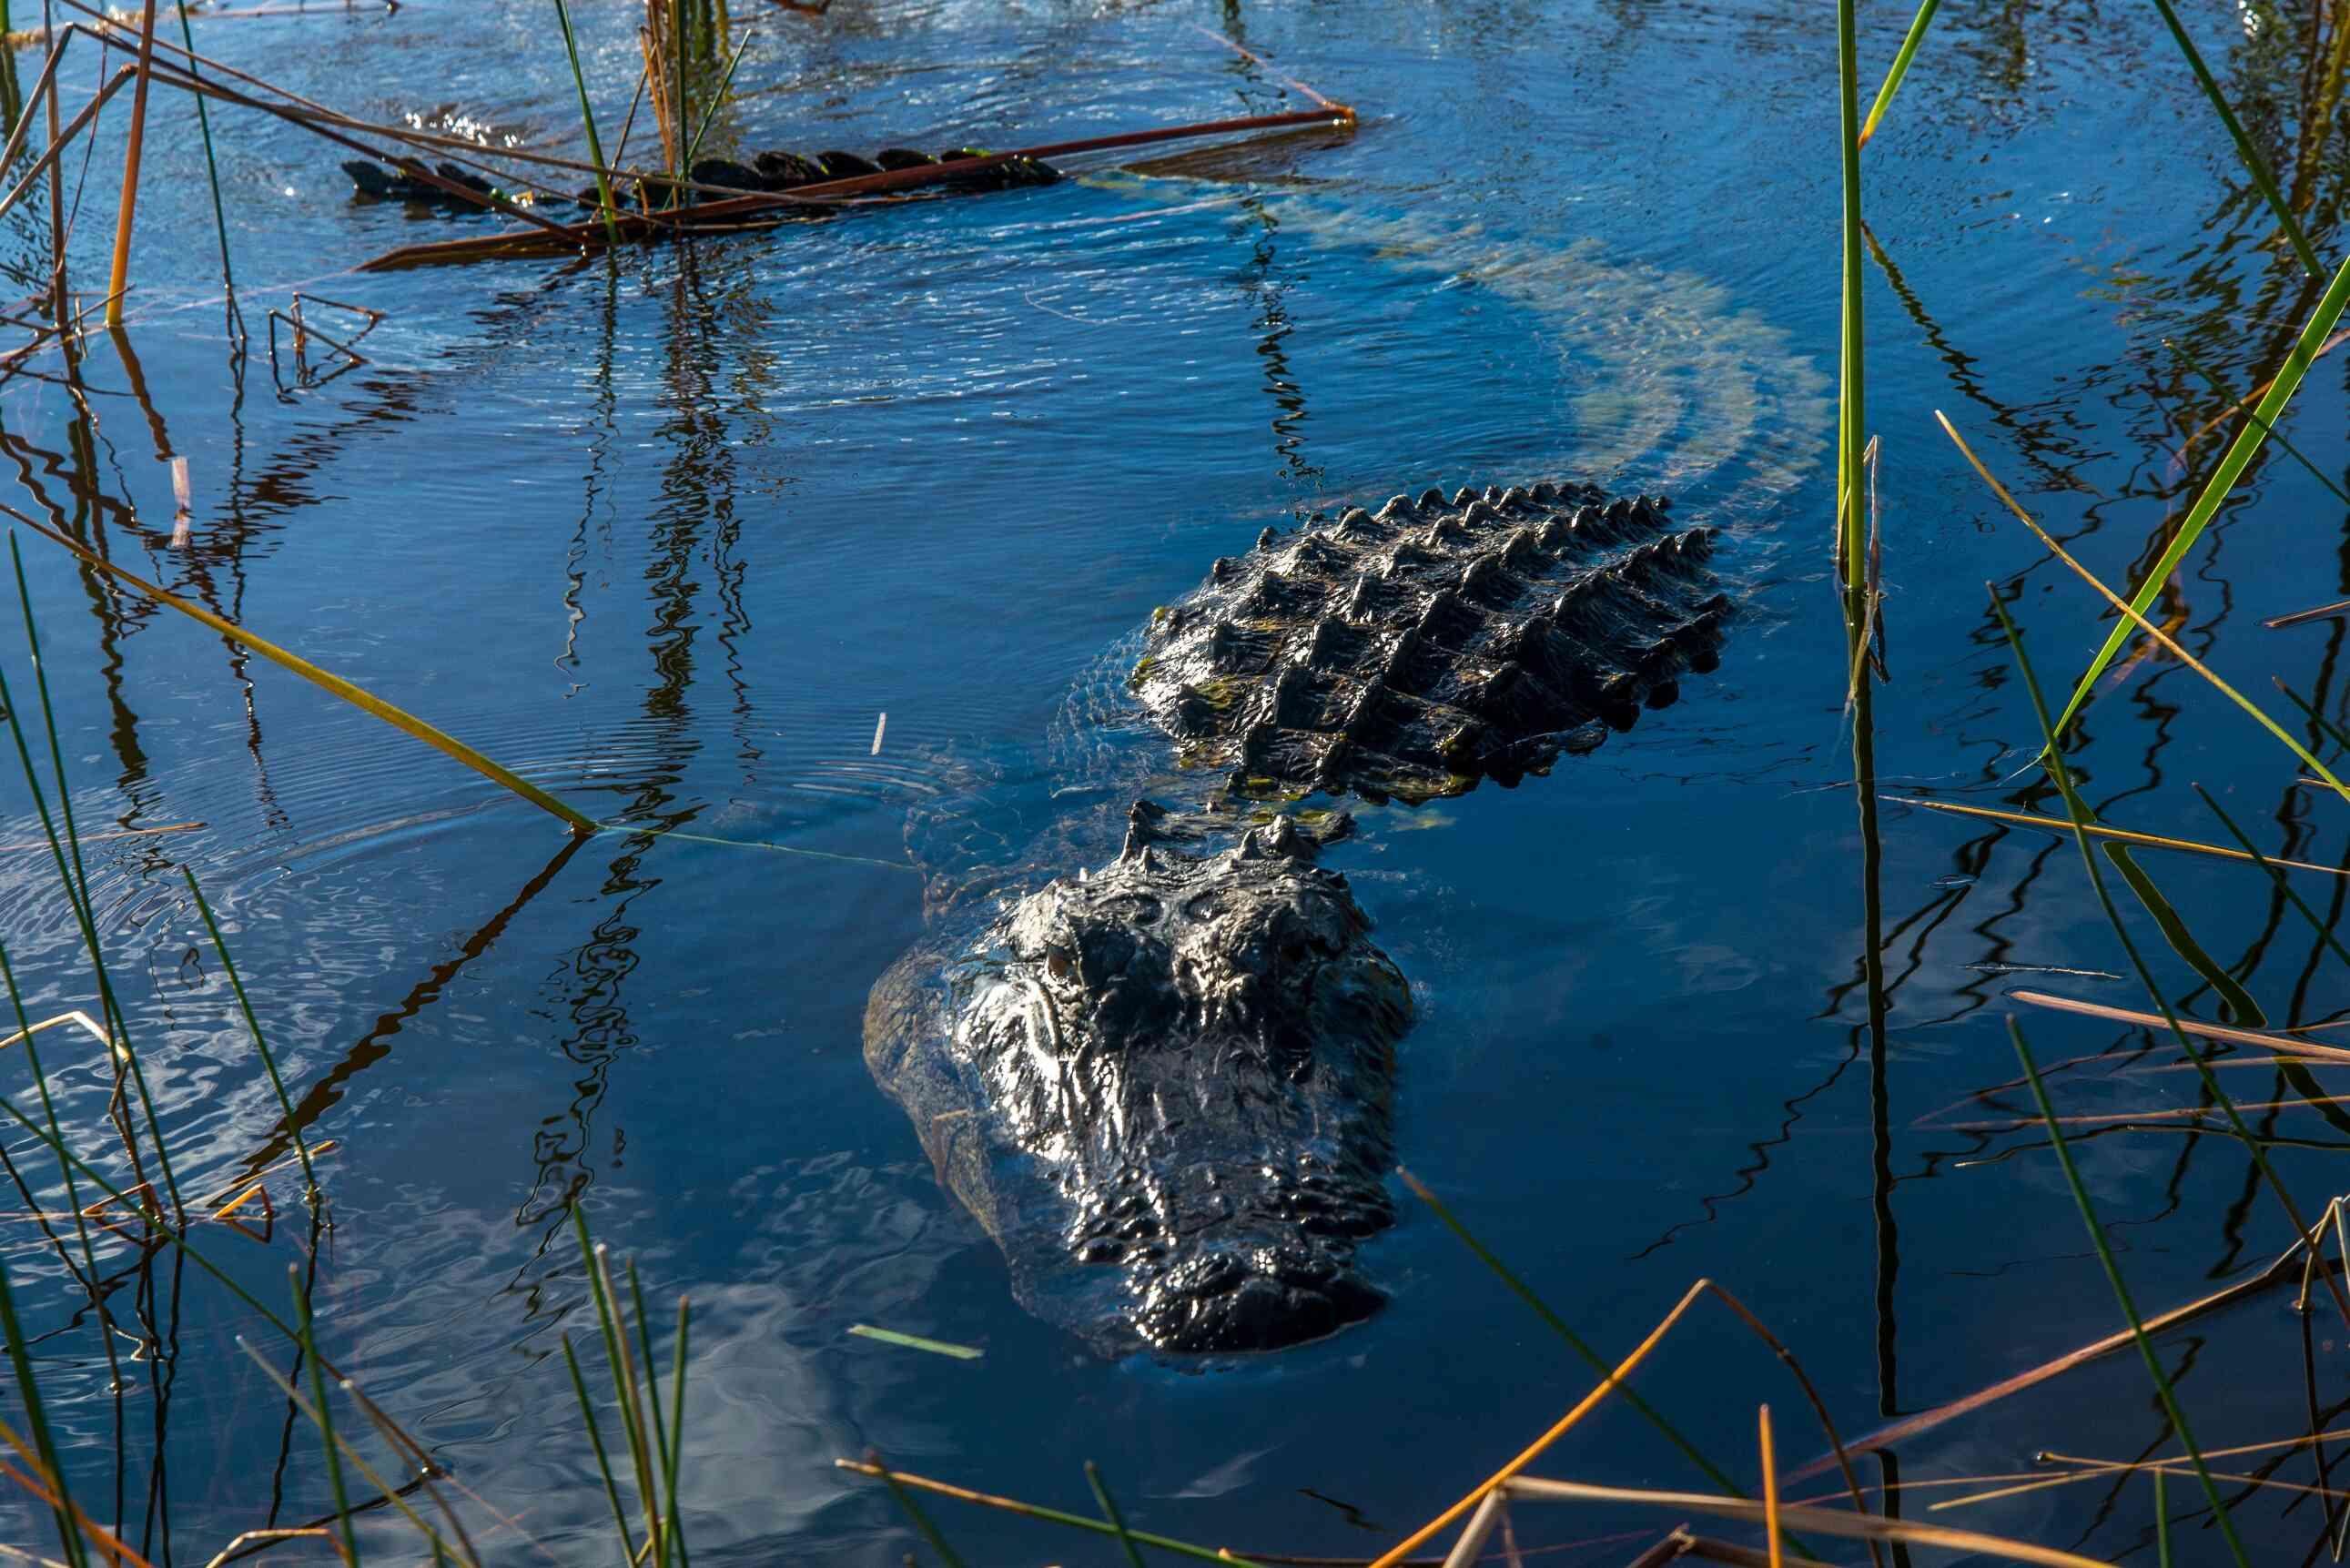 Swimming alligator in grassy swamp area